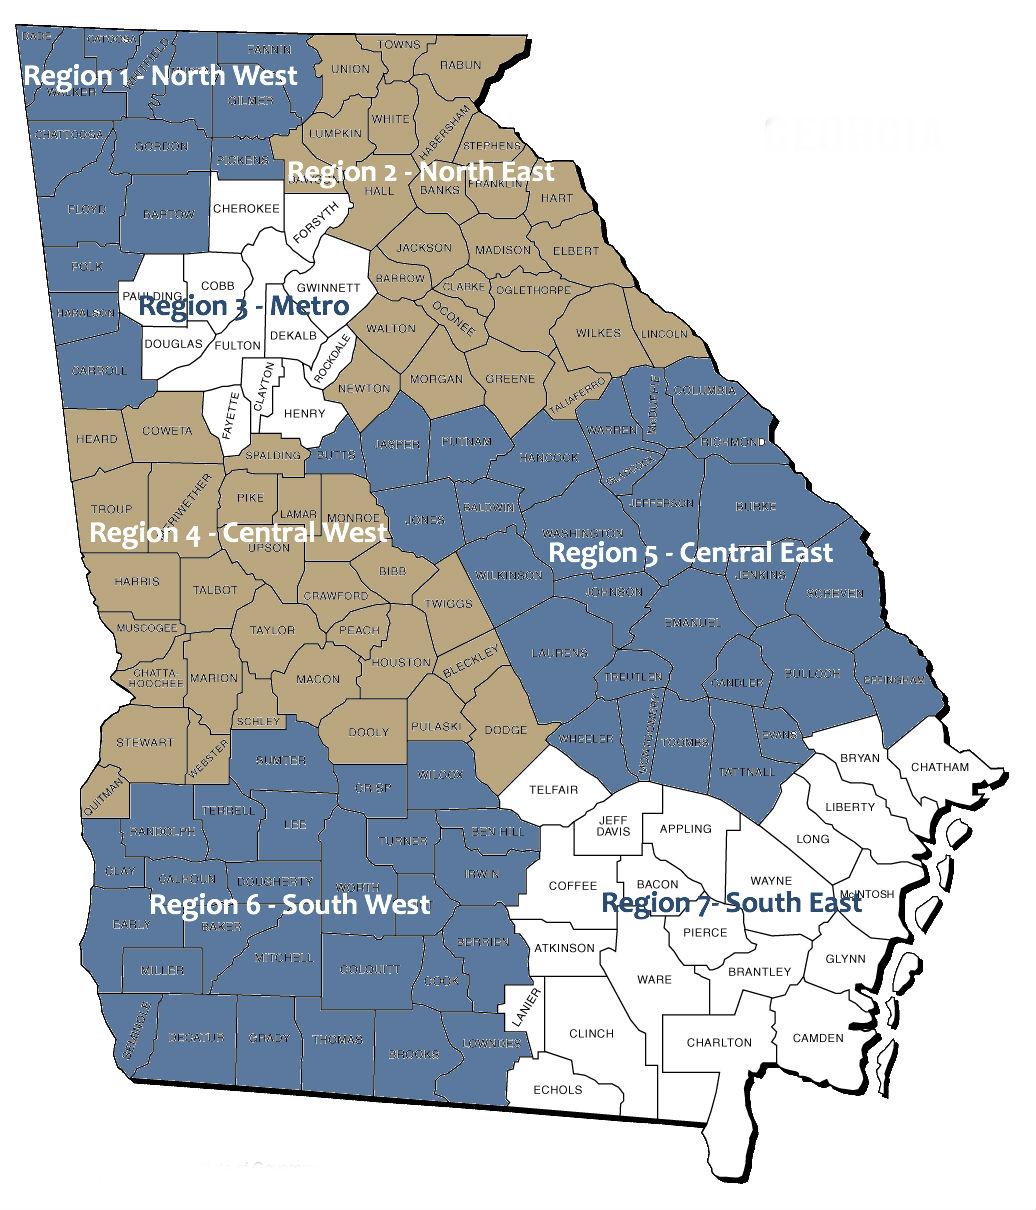 counties comprising regions